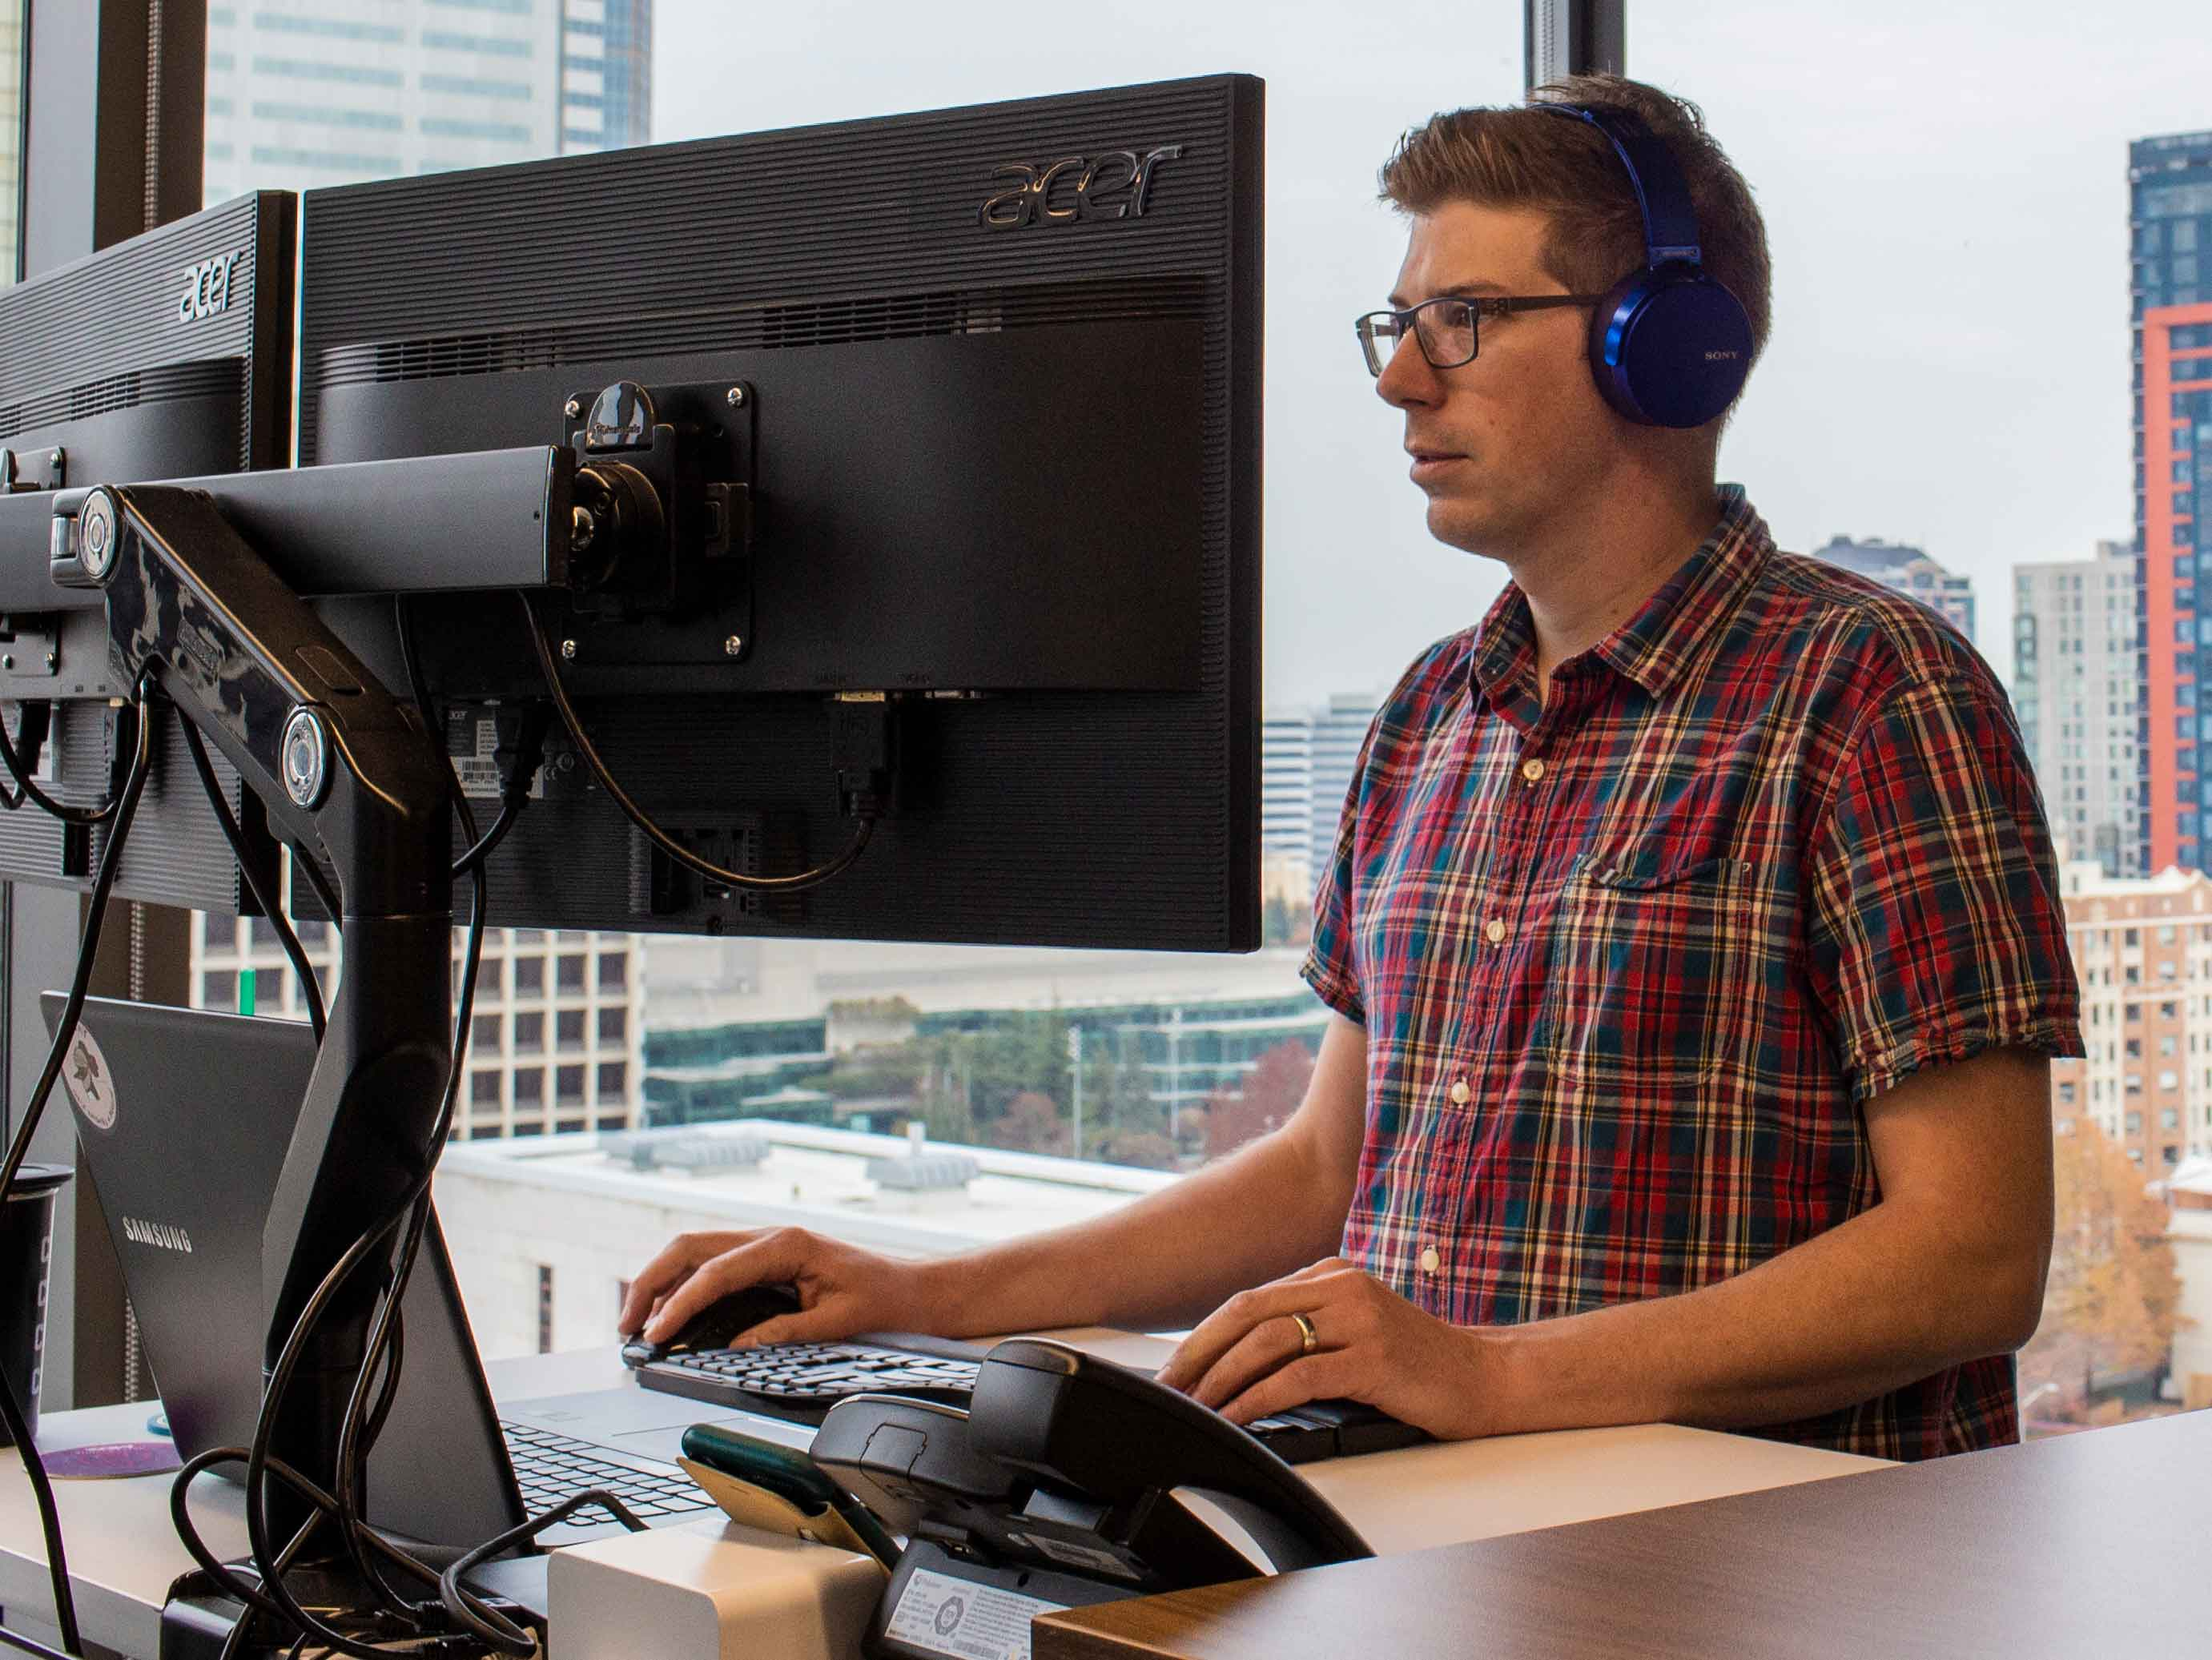 Zac-Heinrichs-working-hard-at-Portent a digital marketing agency